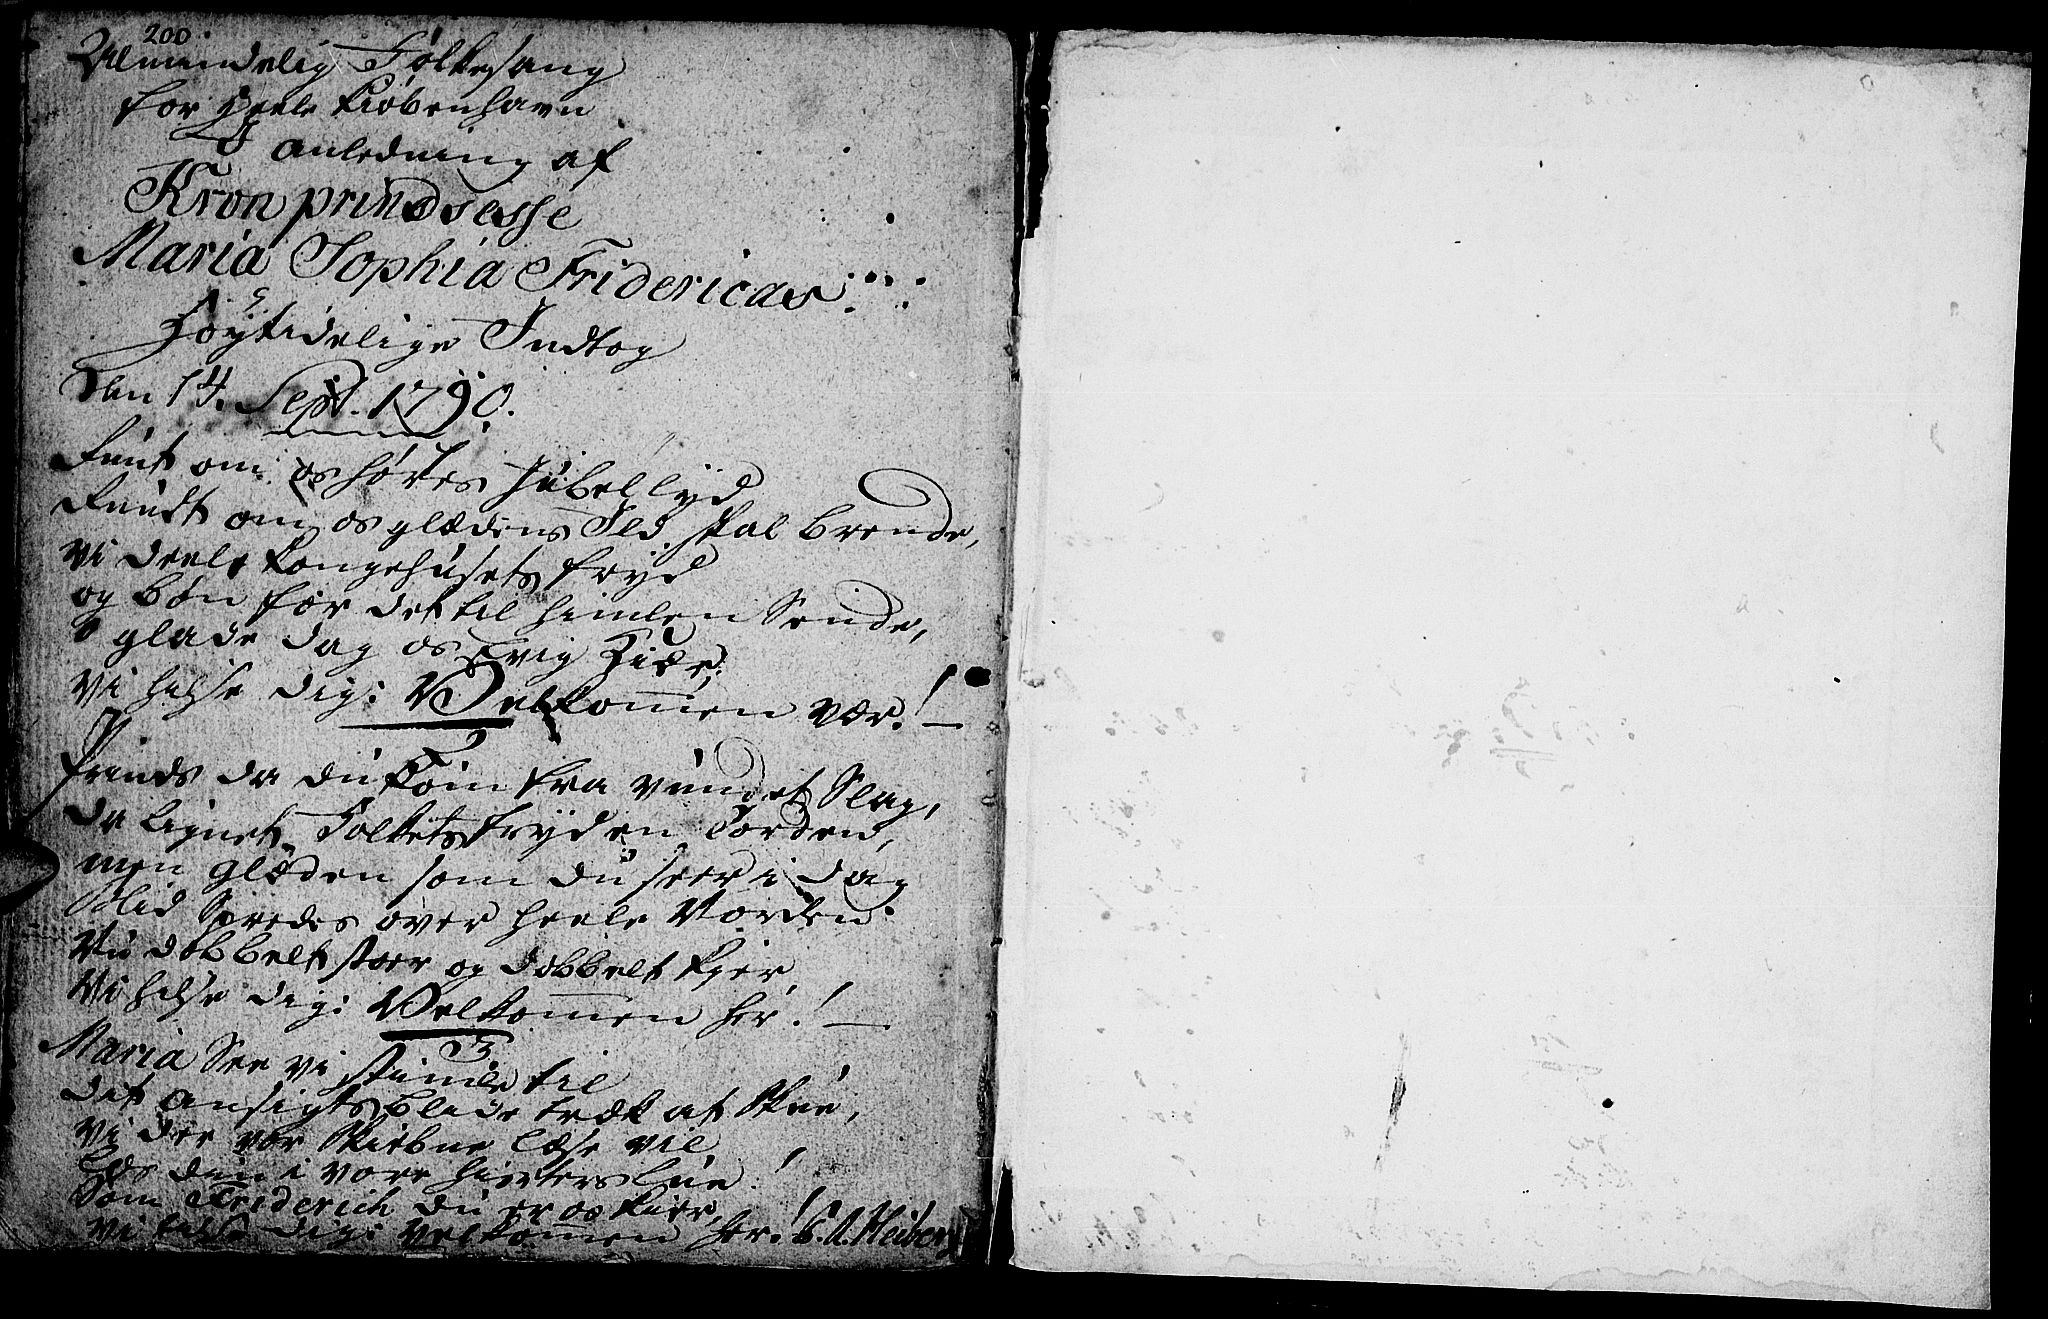 SAH, Vardal prestekontor, H/Ha/Hab/L0001: Klokkerbok nr. 1, 1771-1790, s. 200-201